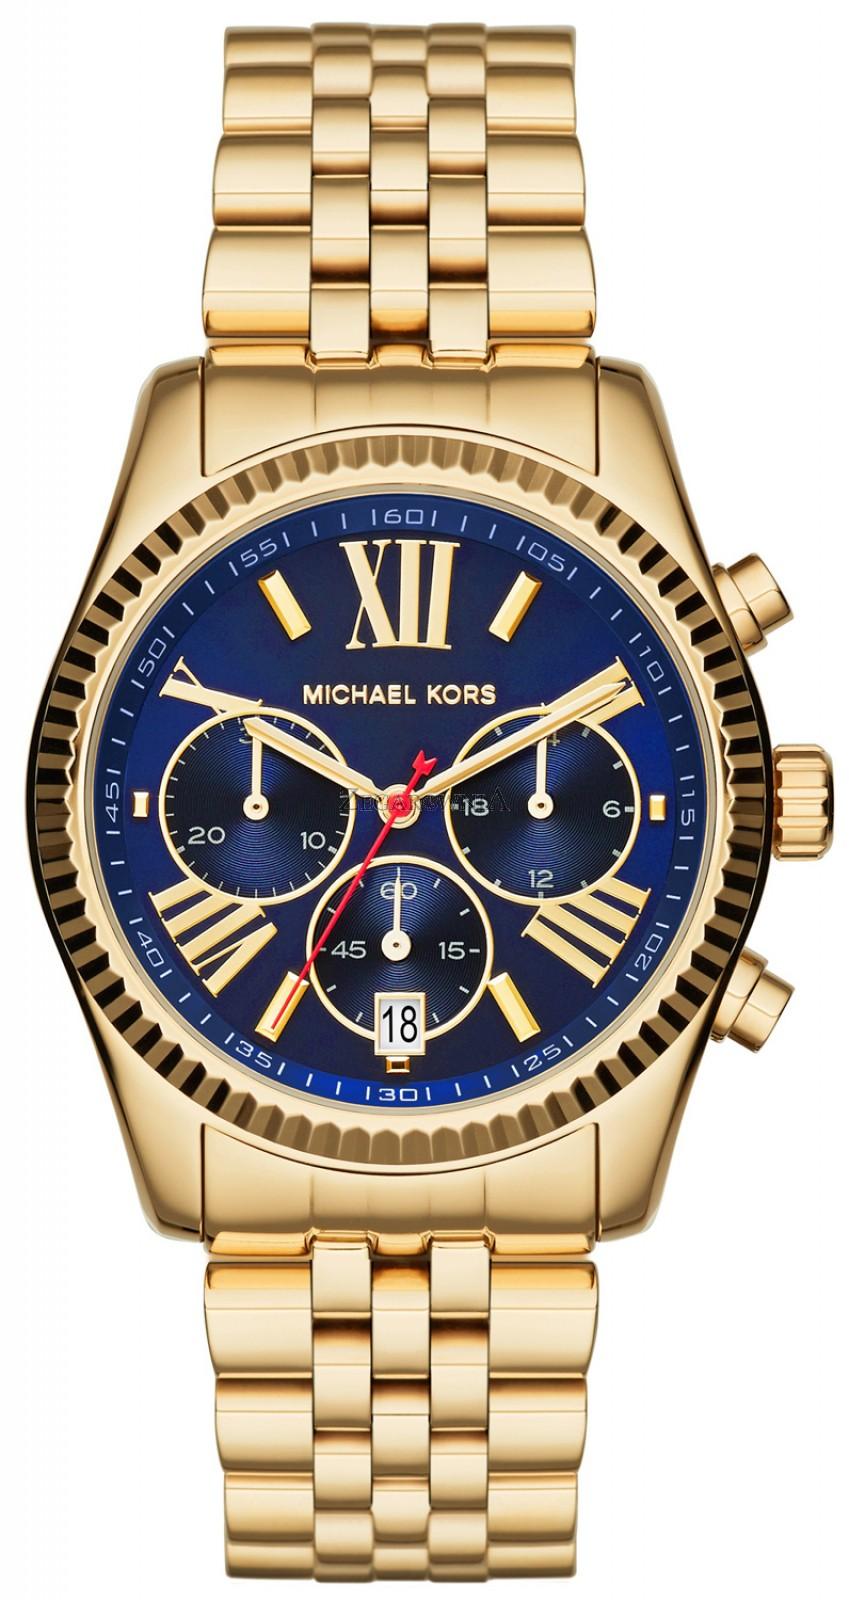 MICHAEL KORS LEXINGTON MK6206 GOLD